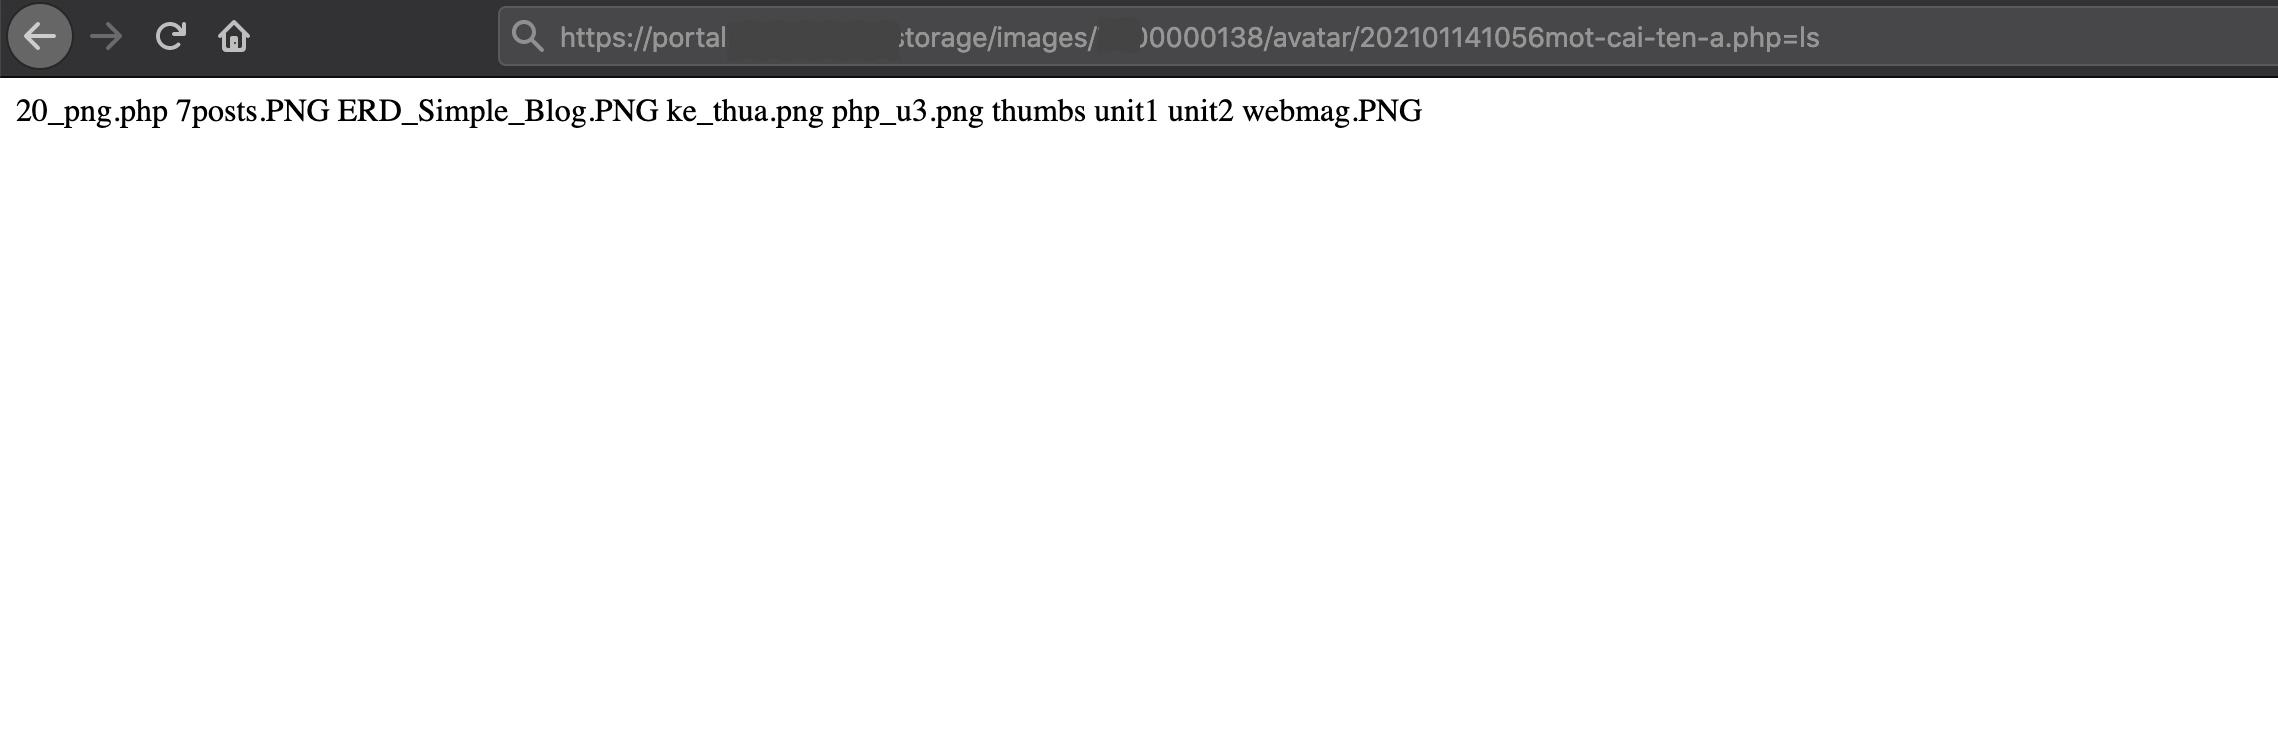 https://manhnv.com/images/posts/hacking/chi-mot-buoi-chieu-toi-da-chiem-quyen-dieu-khien-server-cua-8-website-nhu-the-nao/Screen_Shot_2021-01-14_at_14.48.01.png